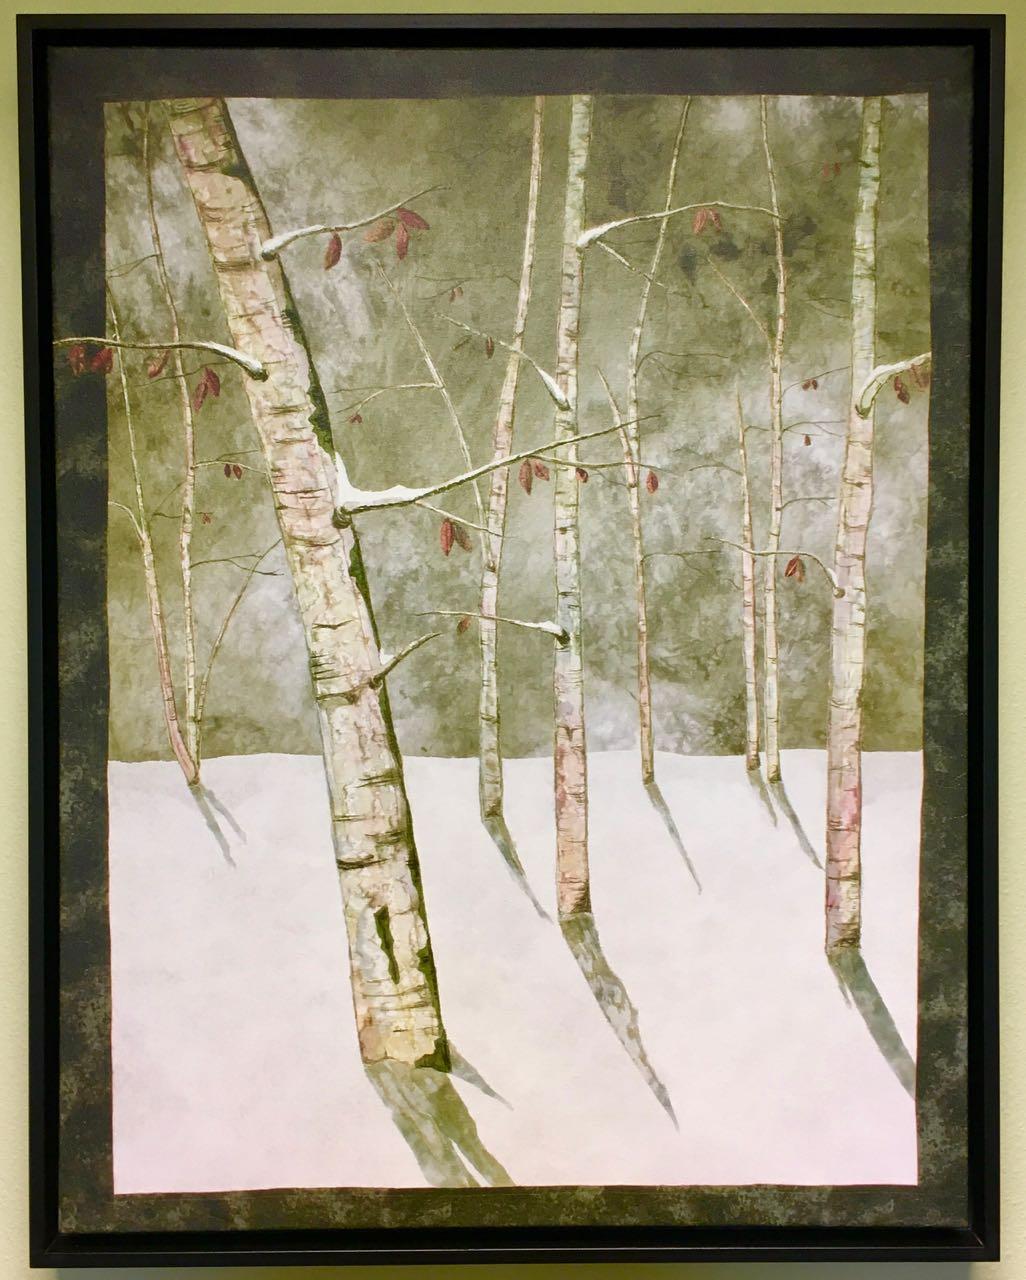 Moon Lit Birches Original Giclée Canvas Print Reproduction of Artwork by Nancy Zieman available at shopnzp.com